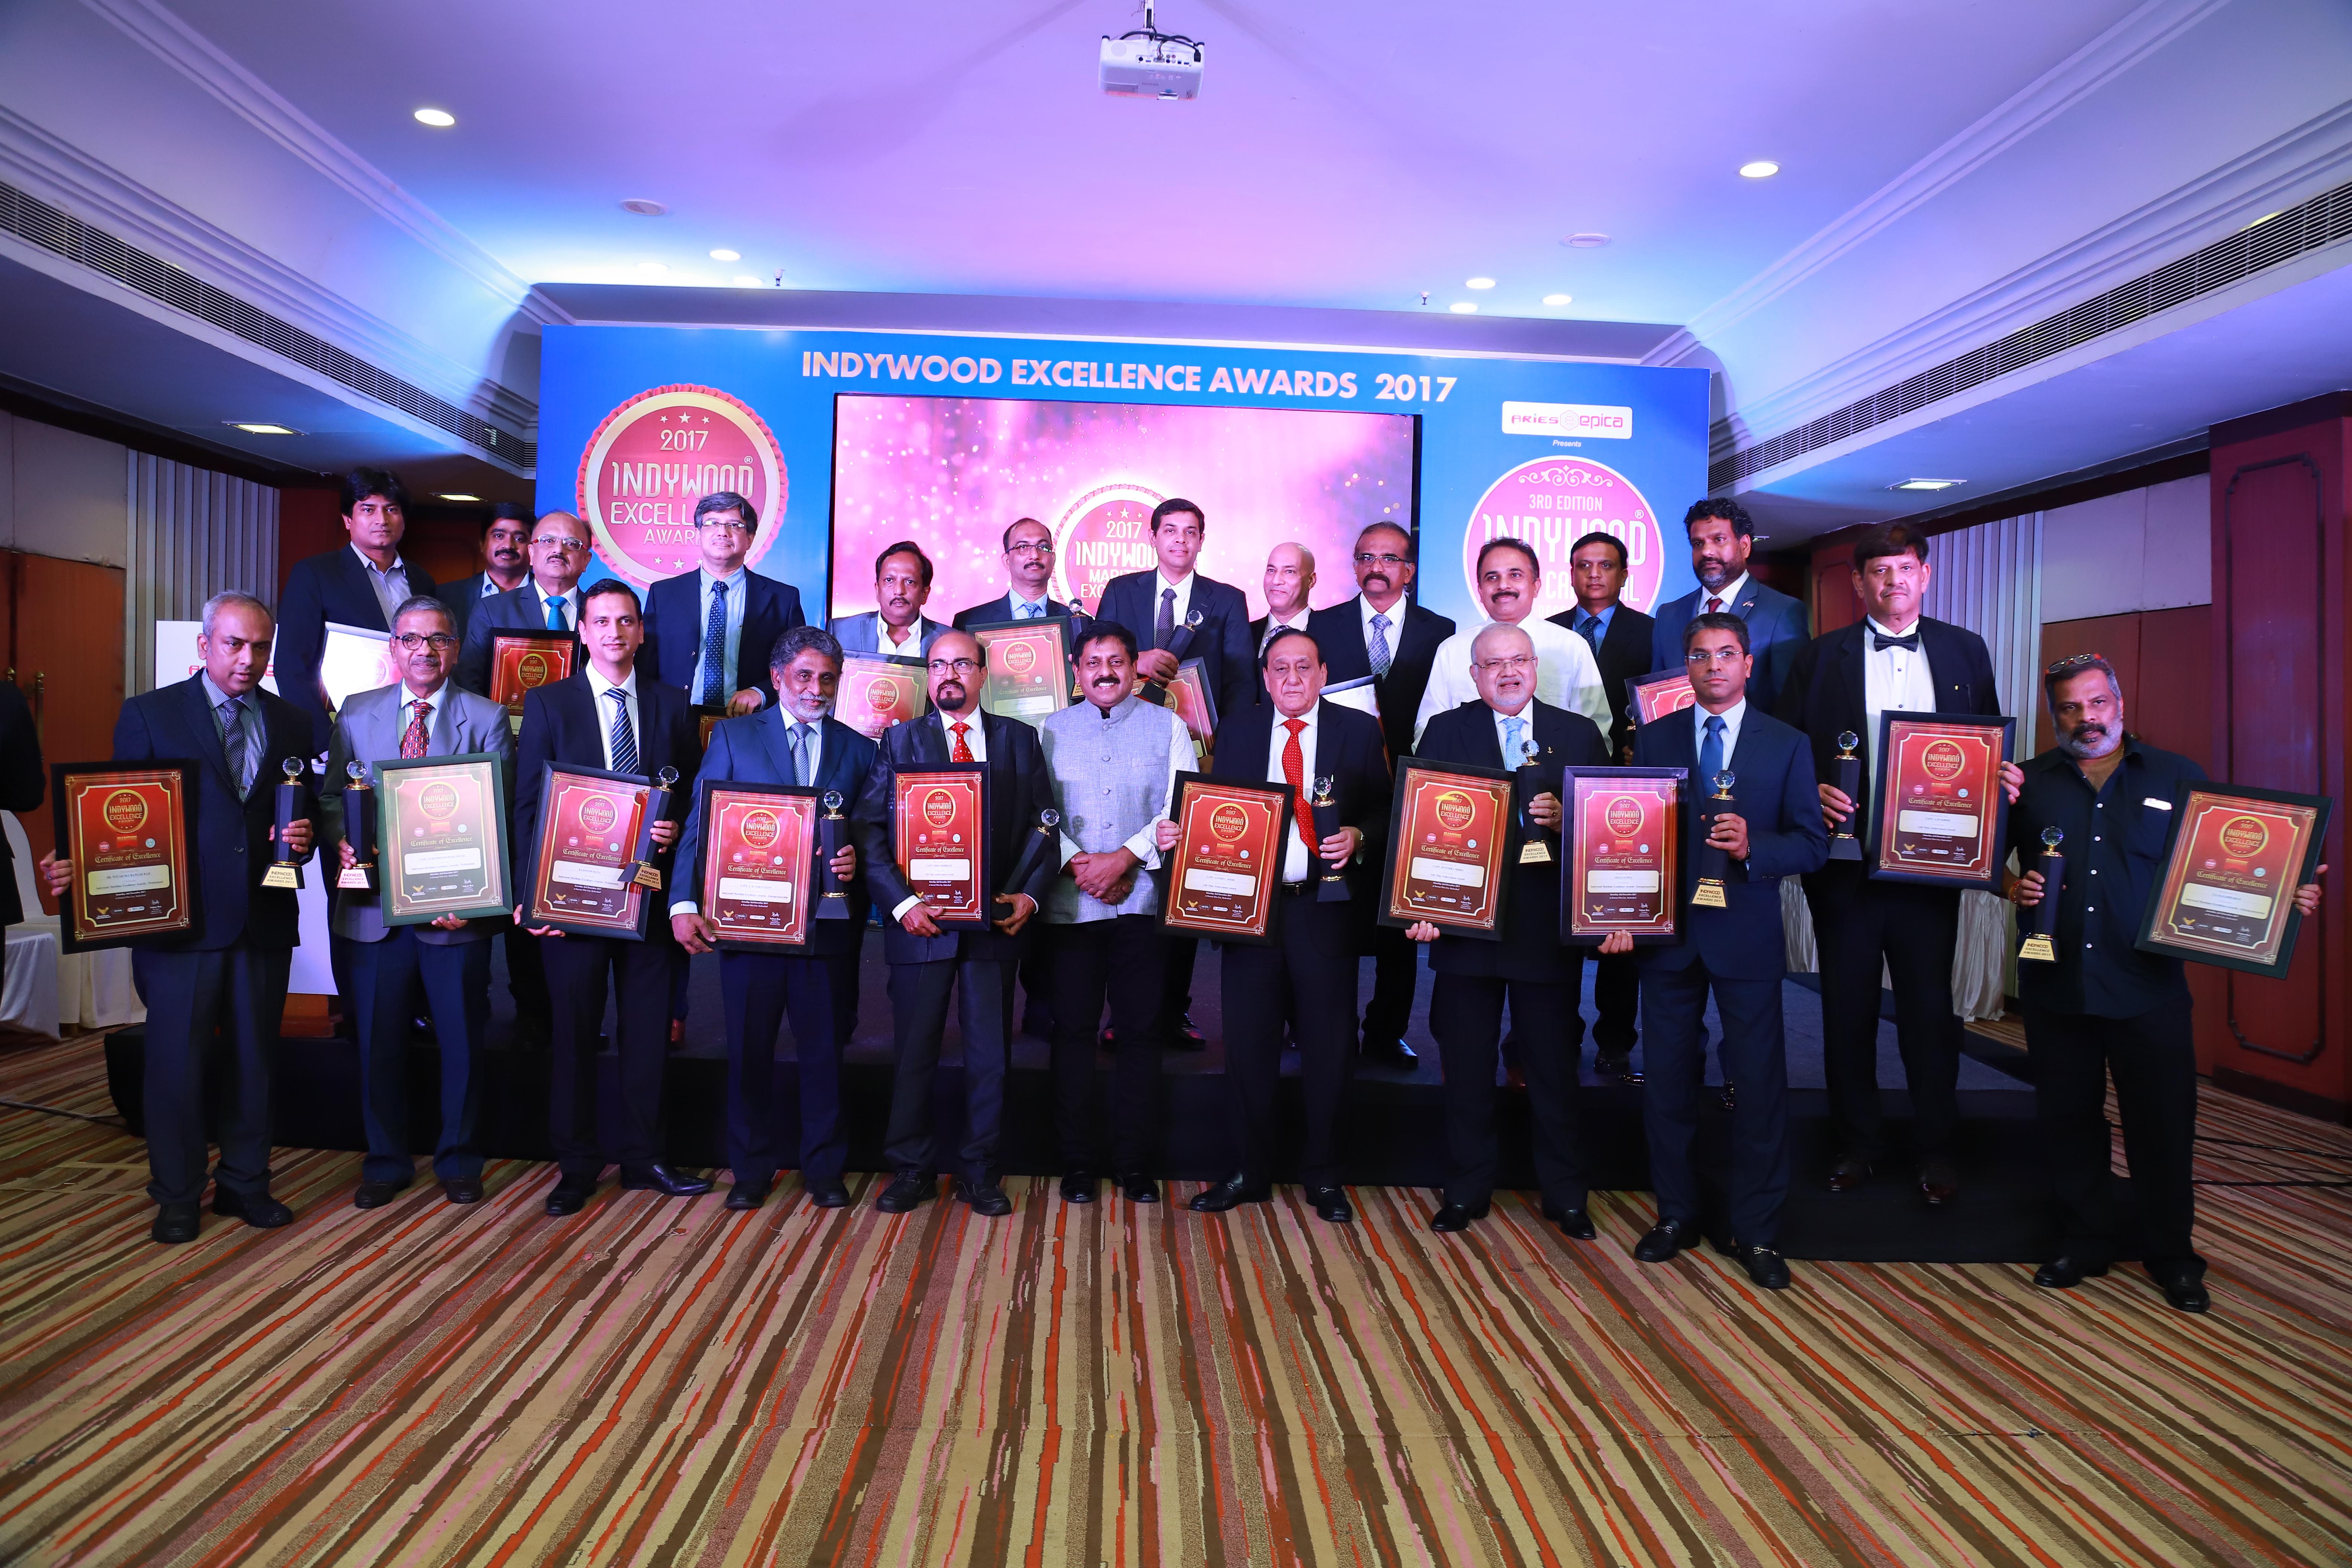 Indywood | Blog|Indywood Maritime Excellence Awards 2017 Honored